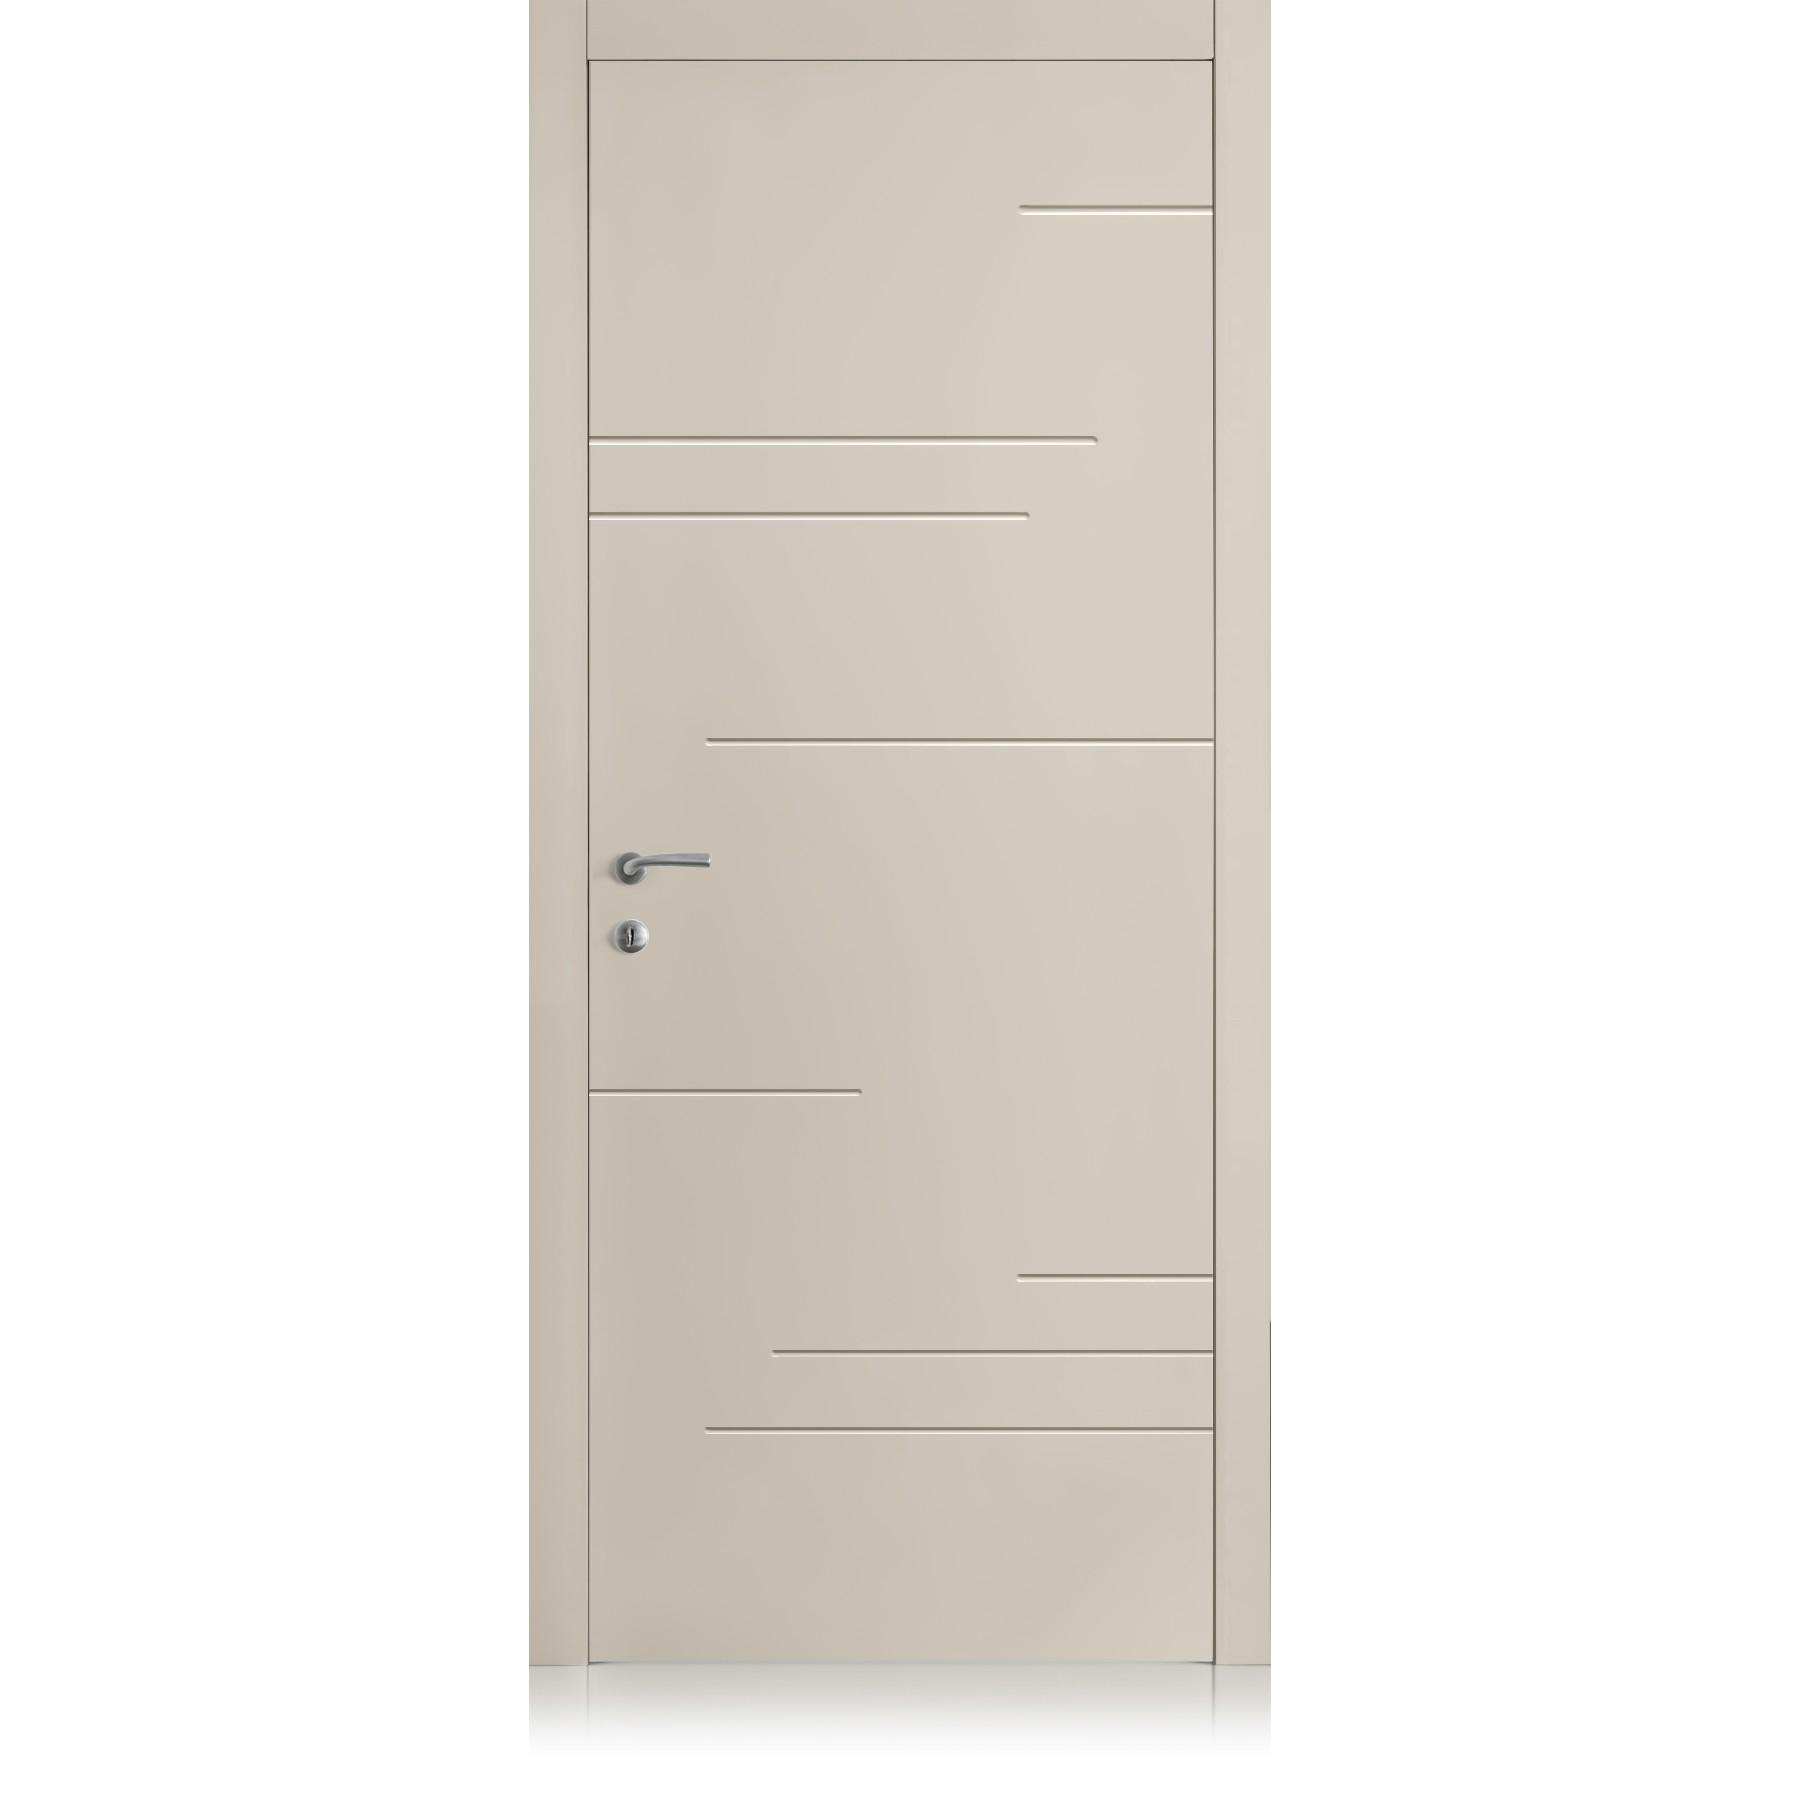 Yncisa Segni tortora door